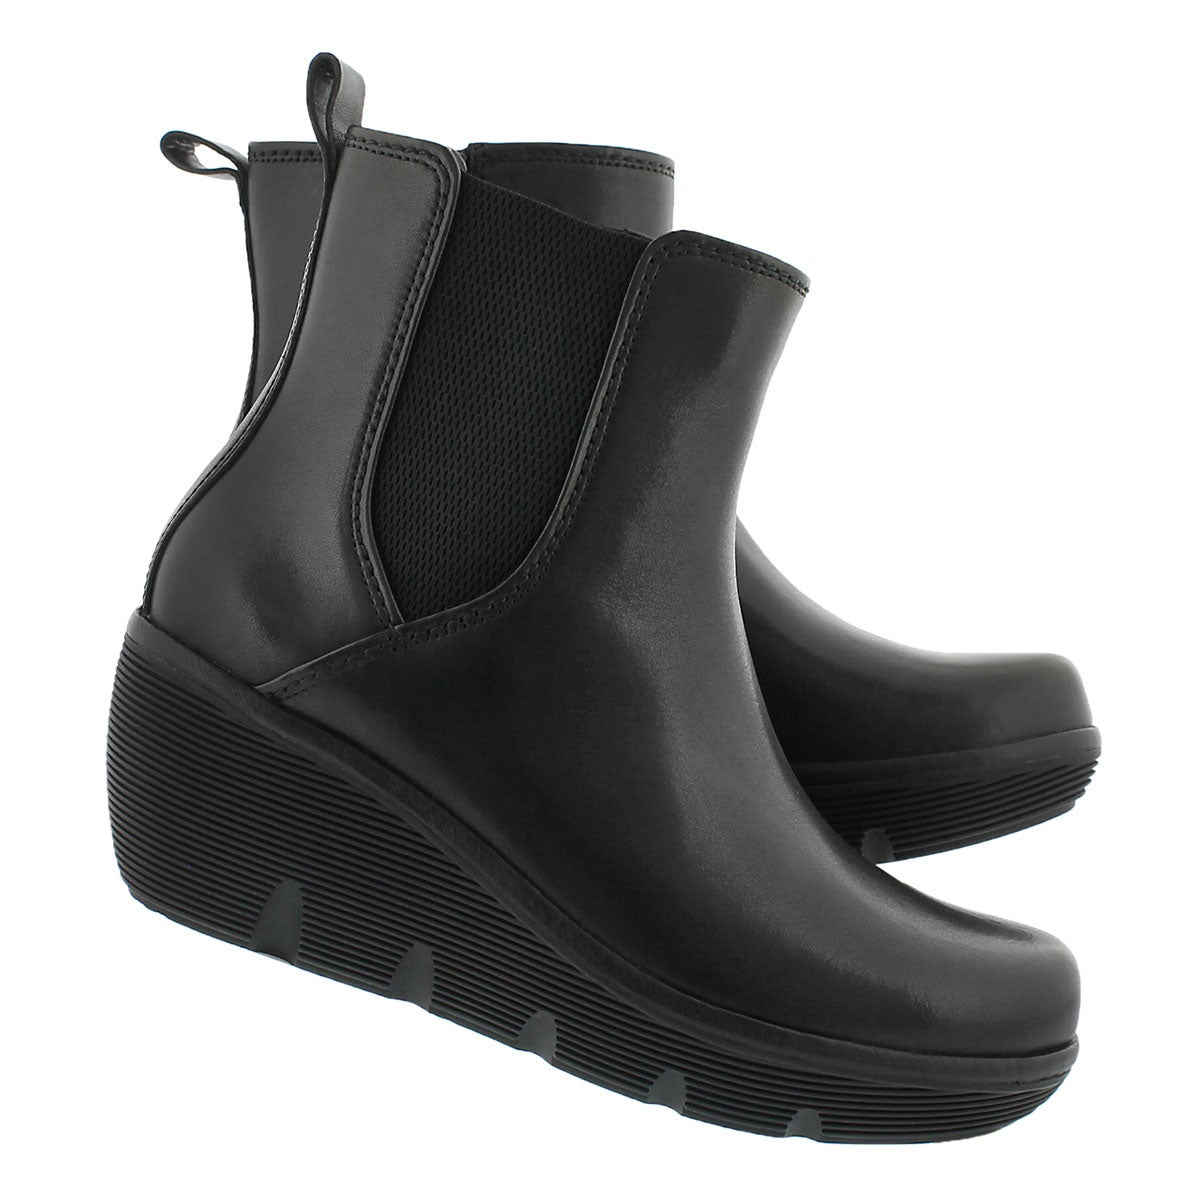 Lds Clarene Surf blk slip on wedge boot